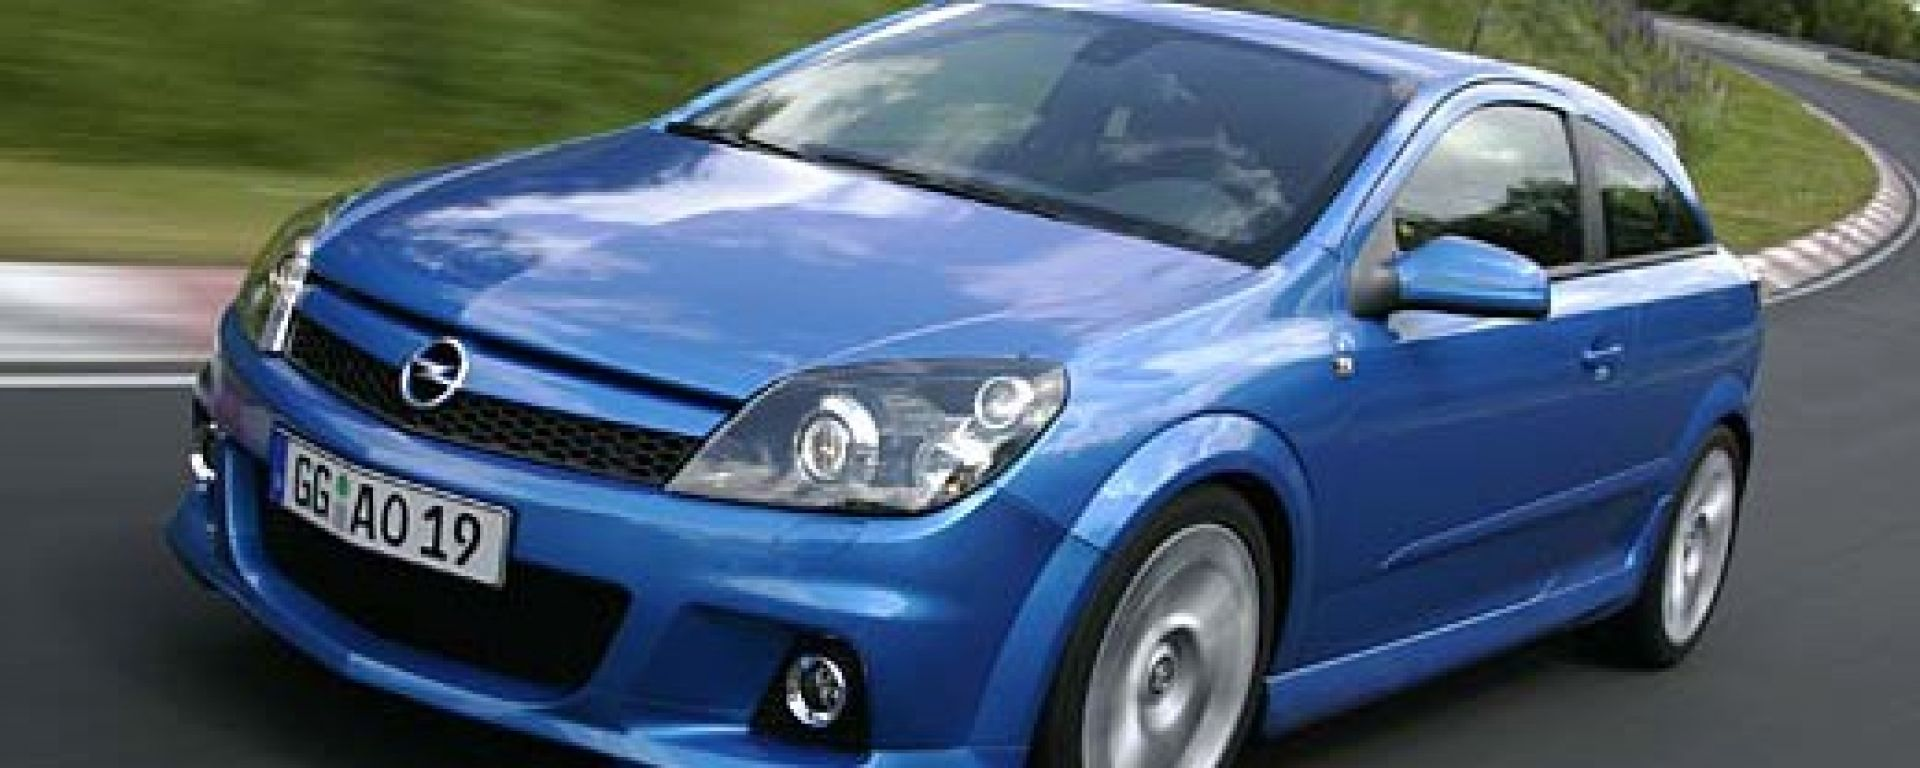 Opel Astra e Zafira OPC